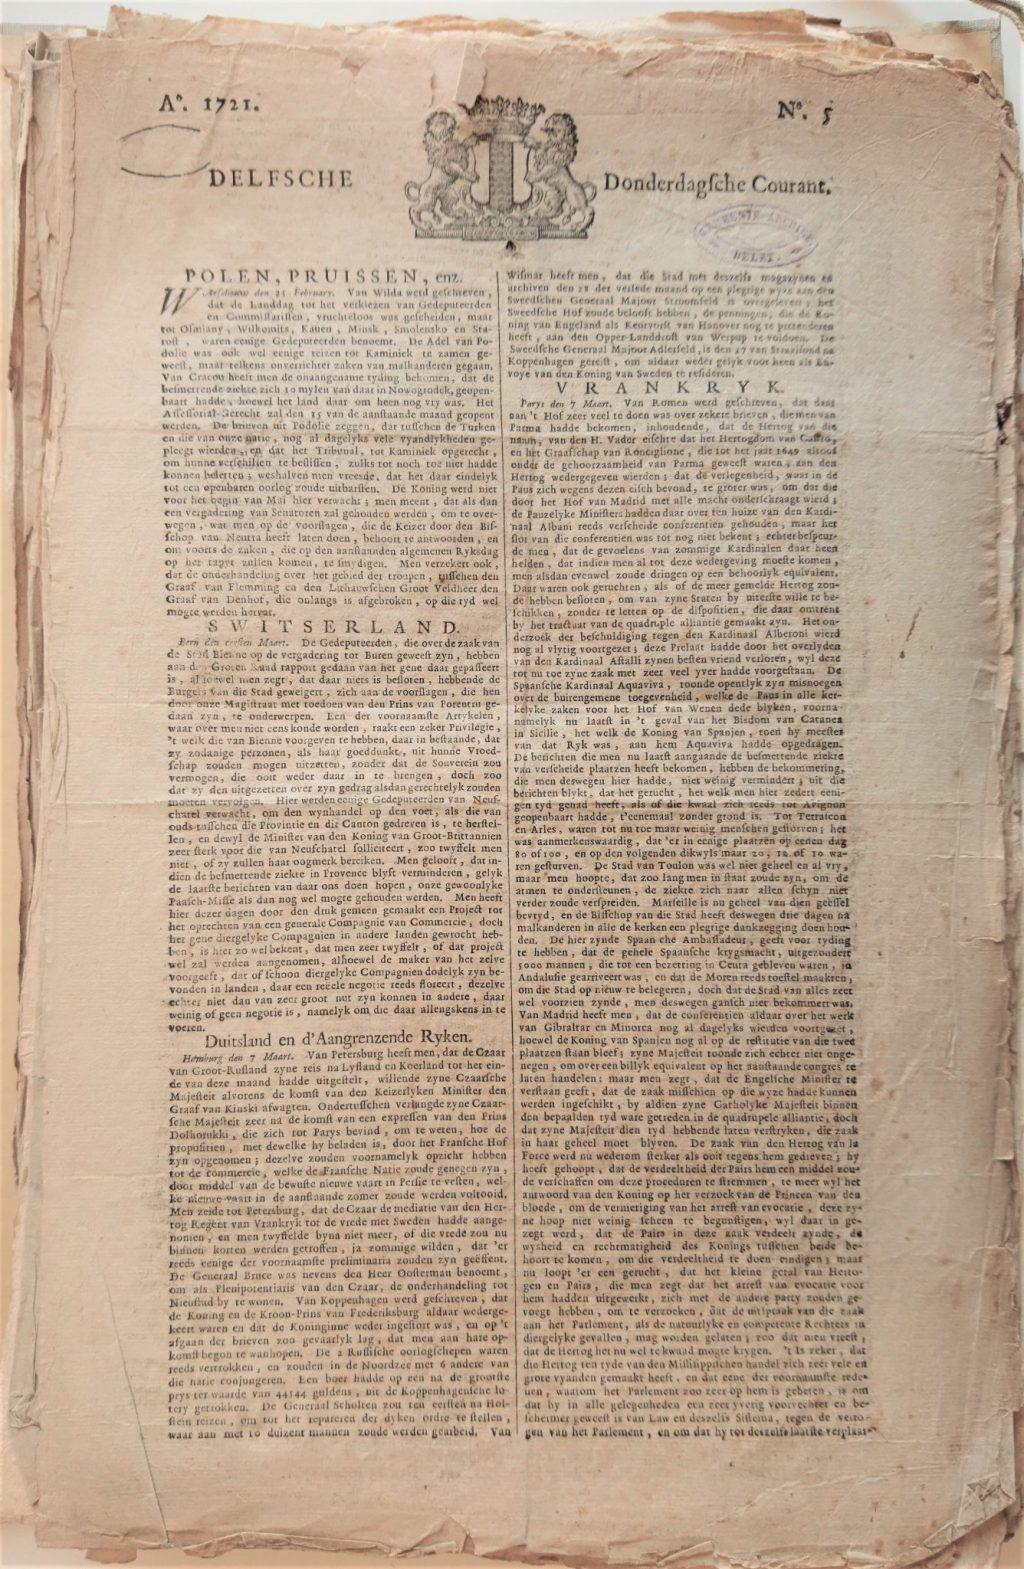 Delfsche Donderdagsche Courant, nummer 5 van 1721. (Bibliotheek)